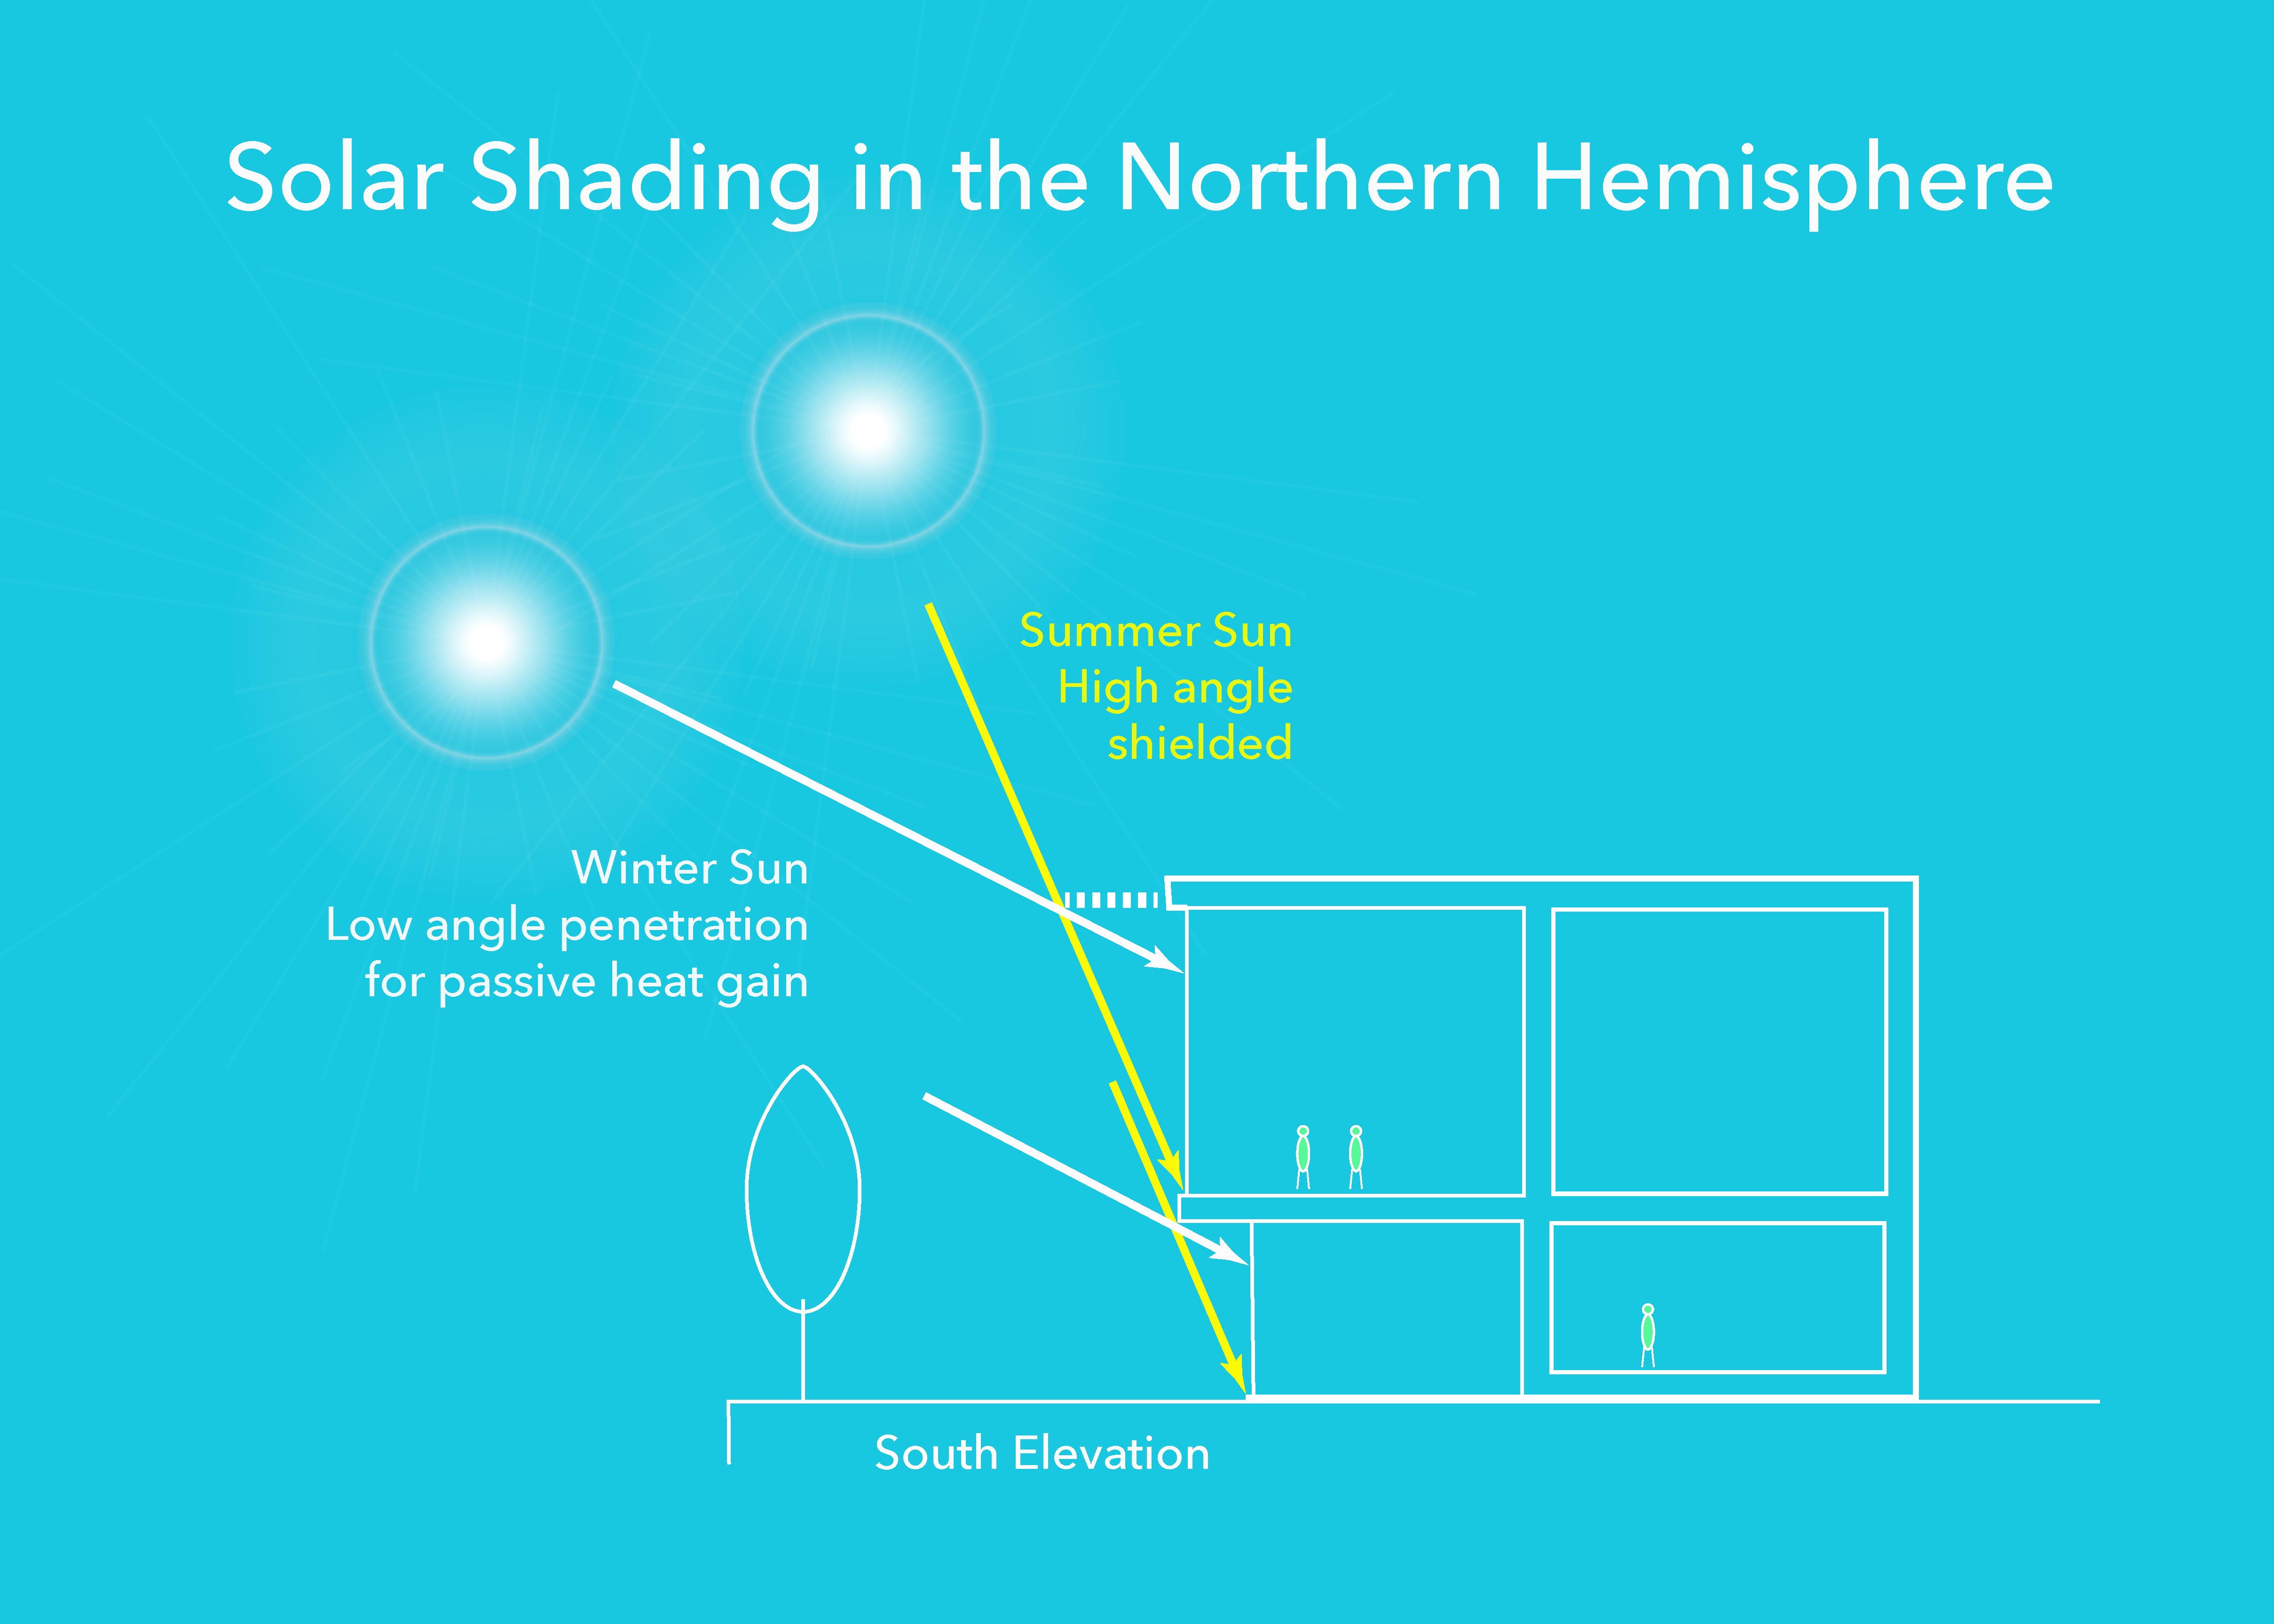 solar sun shading orientation